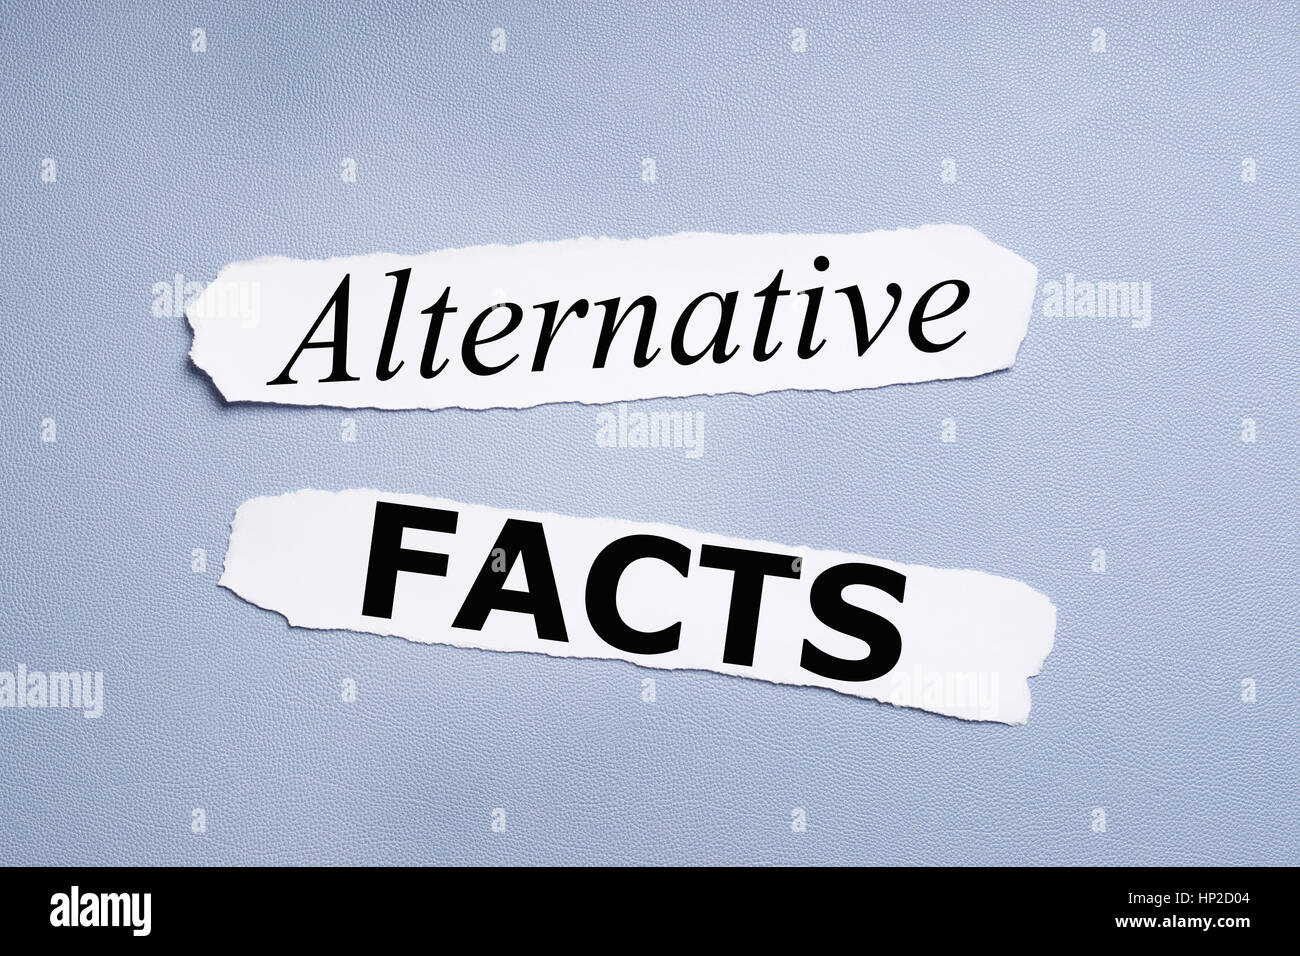 alternative facts - Stock Image